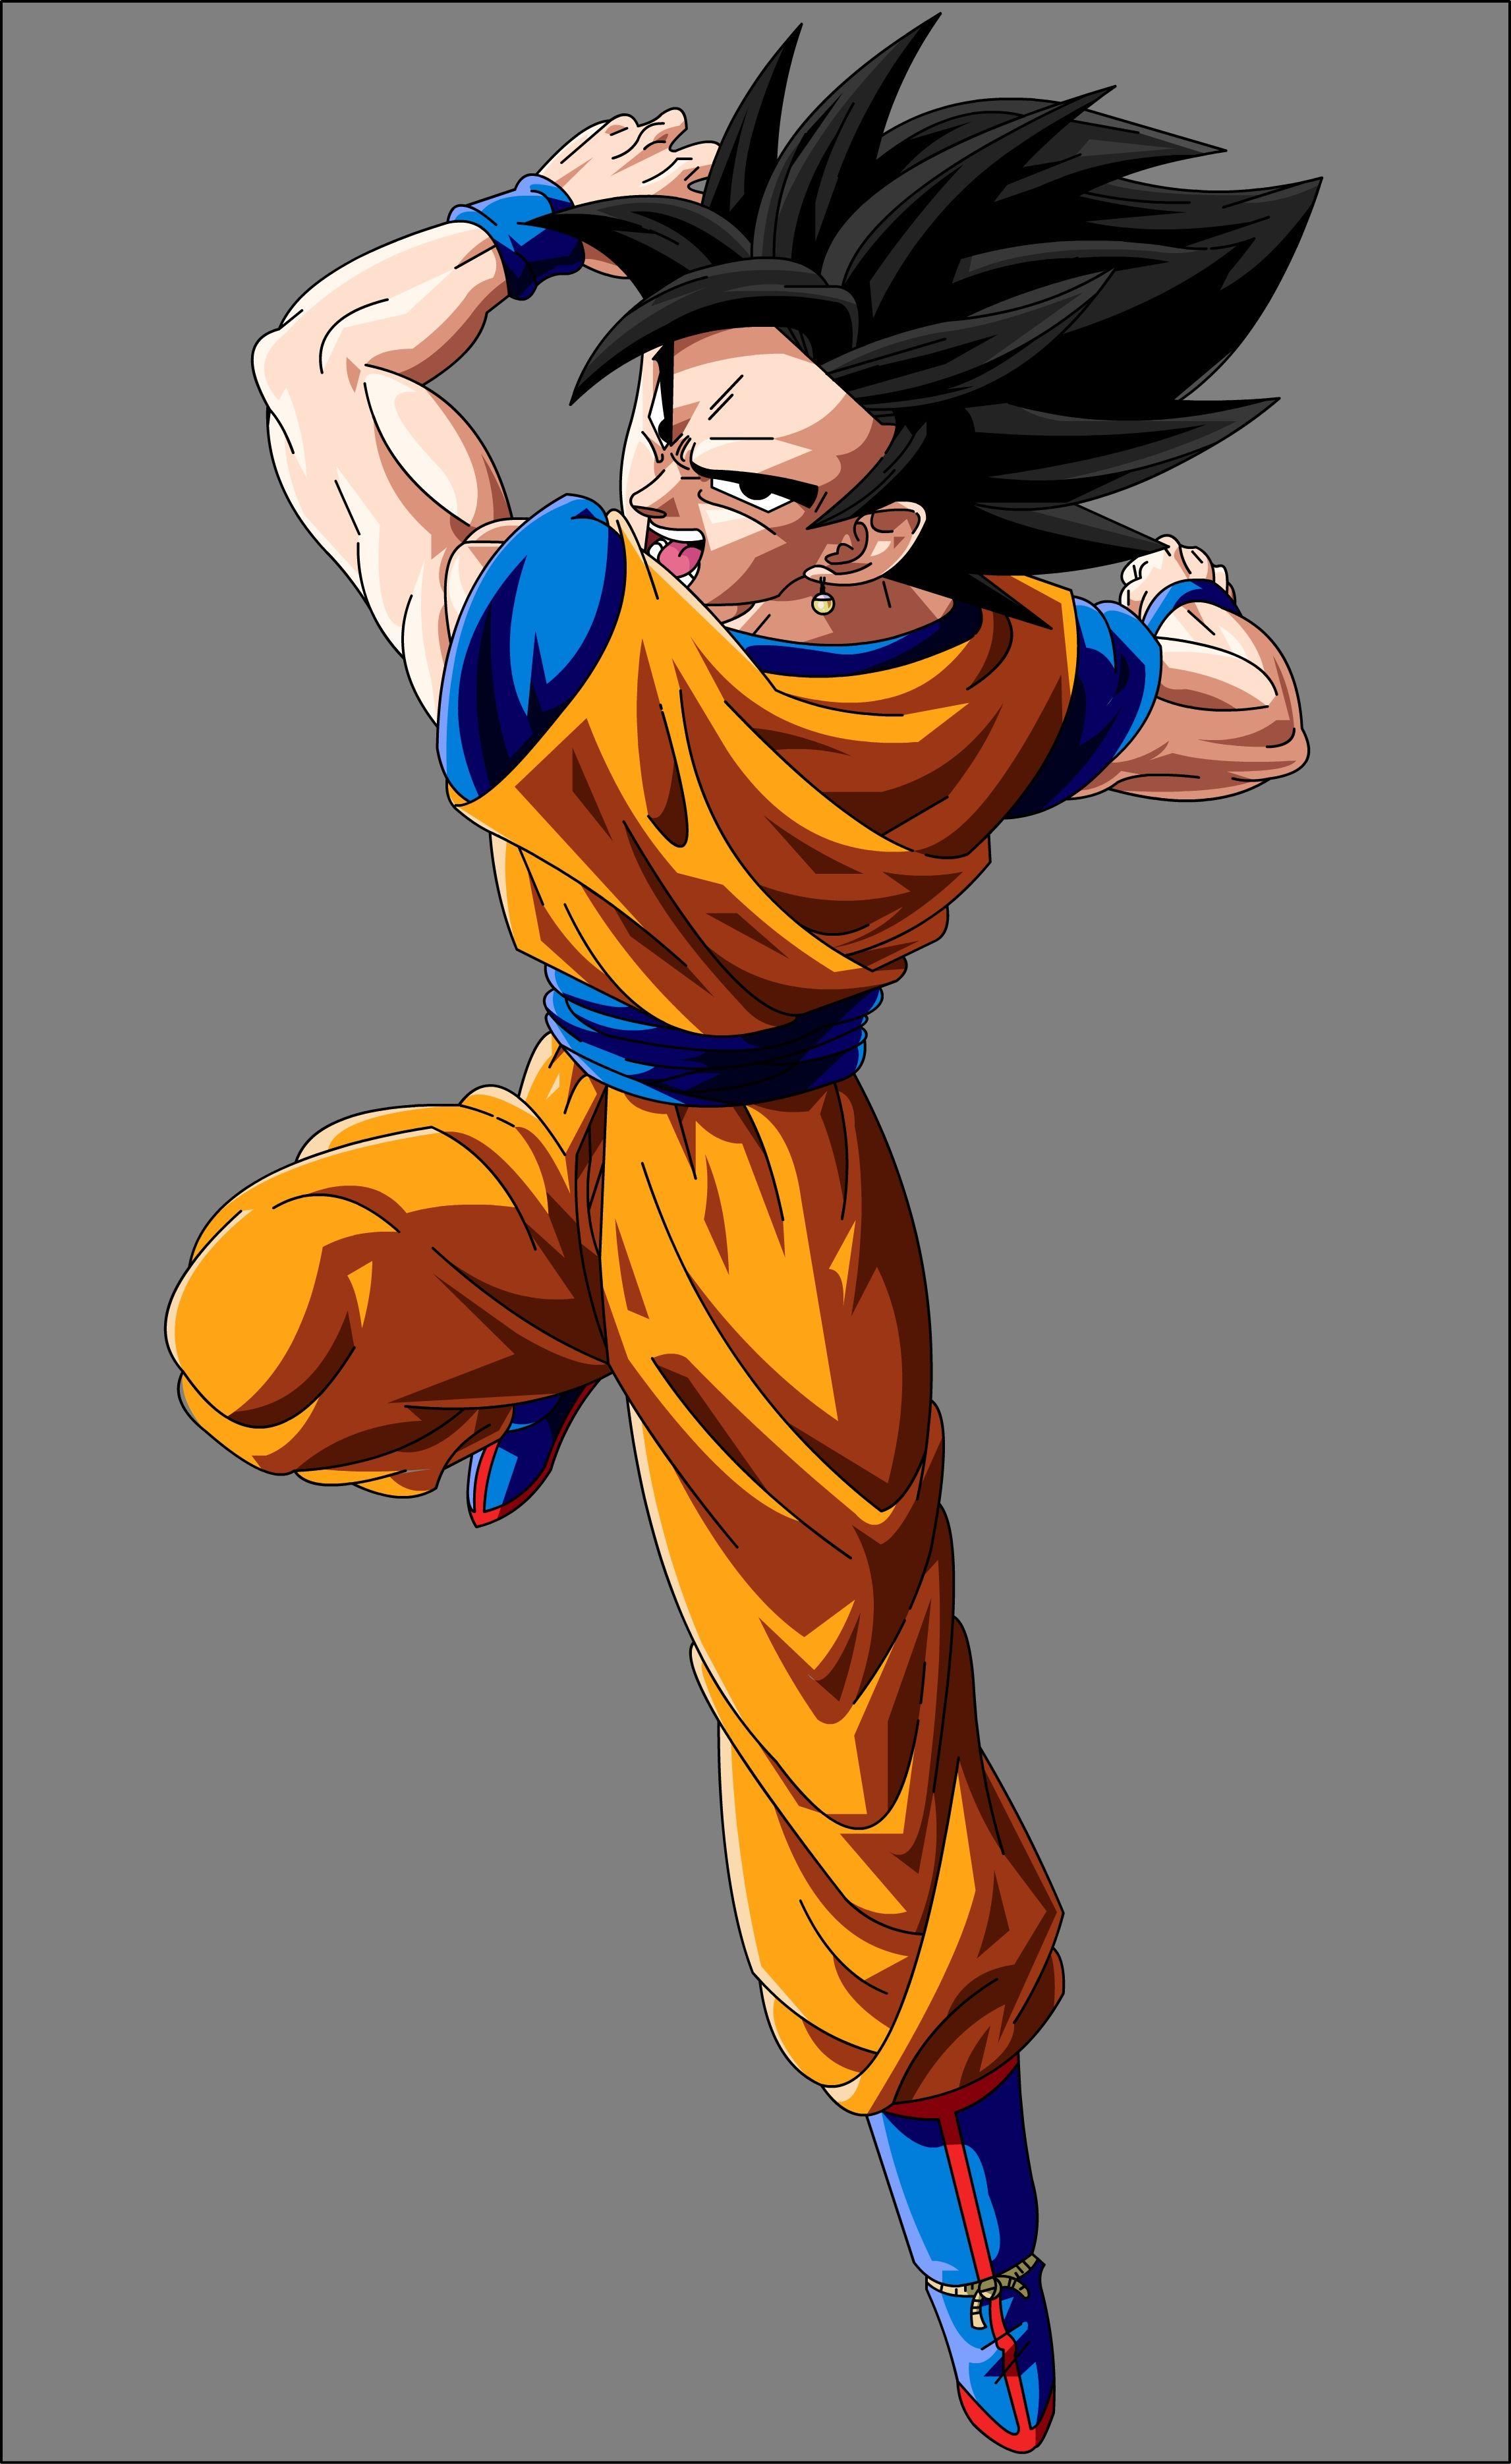 Goku And Gohan Fan Fusion I M Bad With Fusion Names But I Think It S Gokhan Not Sure Though It Dragon Ball Super Goku Dragon Ball Super Manga Goku And Gohan